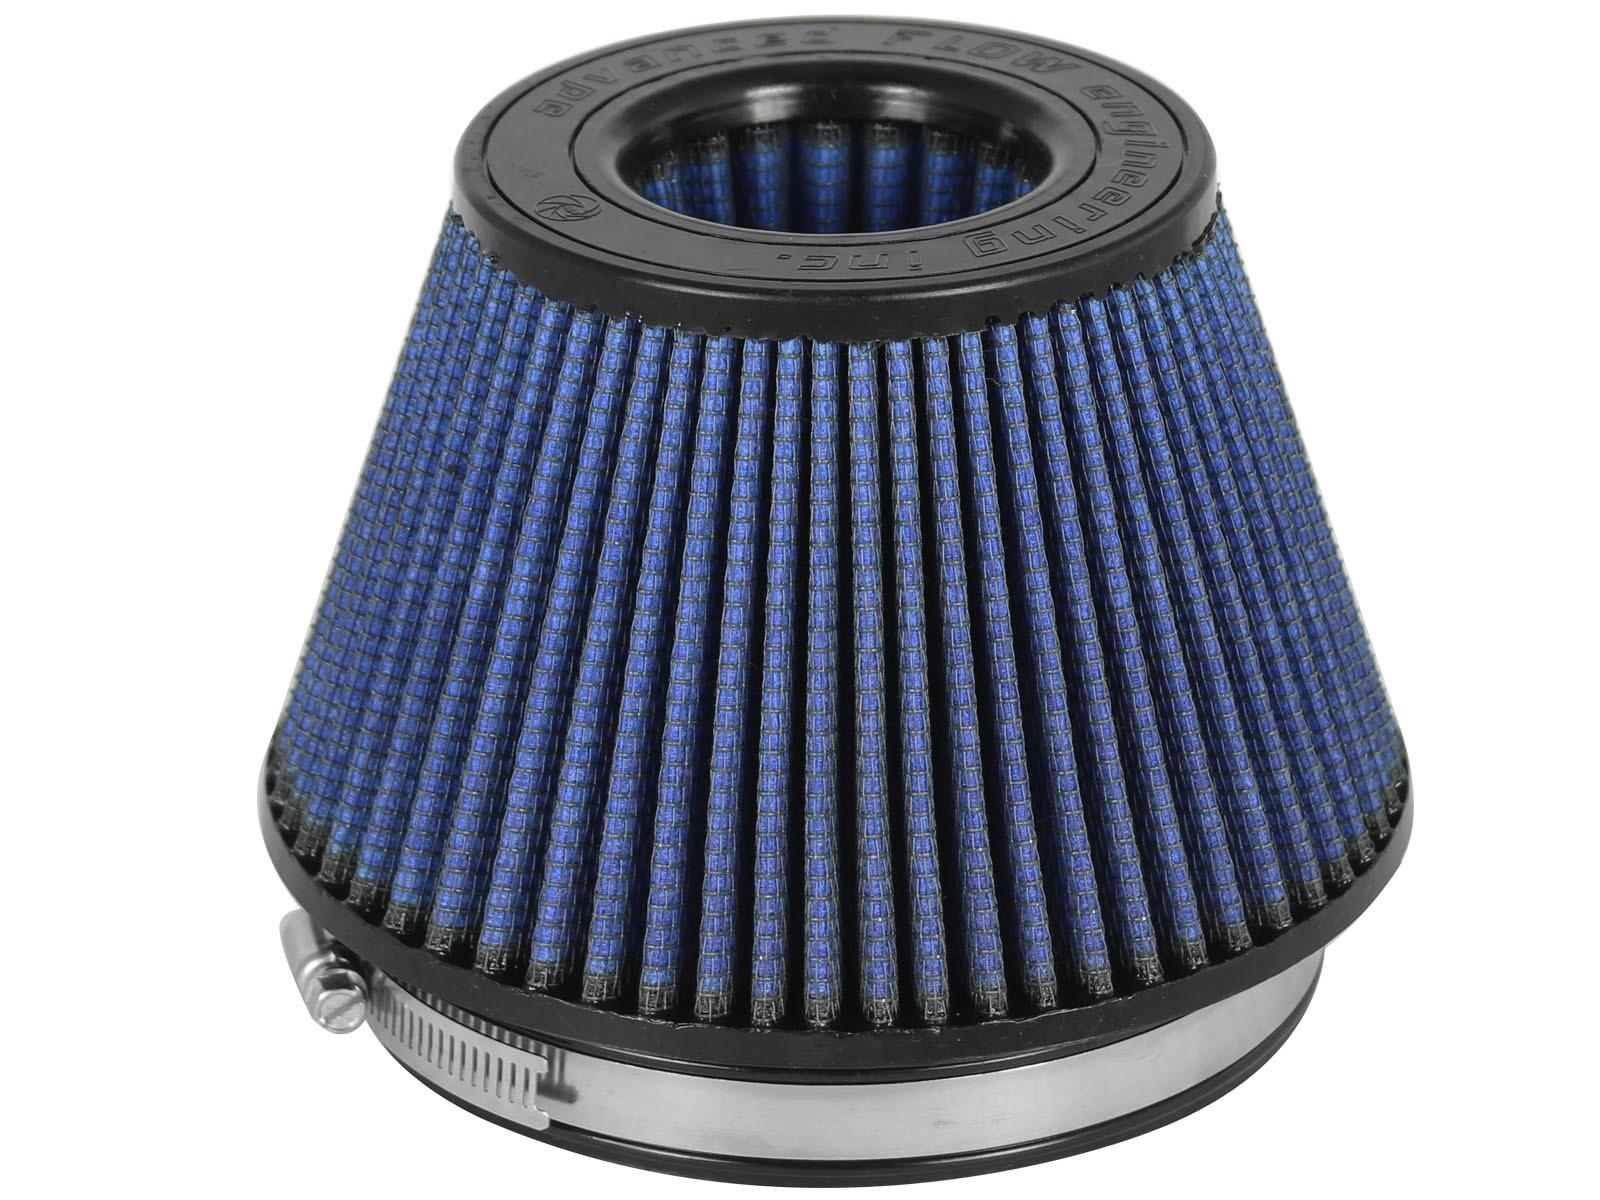 aFe POWER 24-91060 Magnum FLOW Pro 5R Air Filter